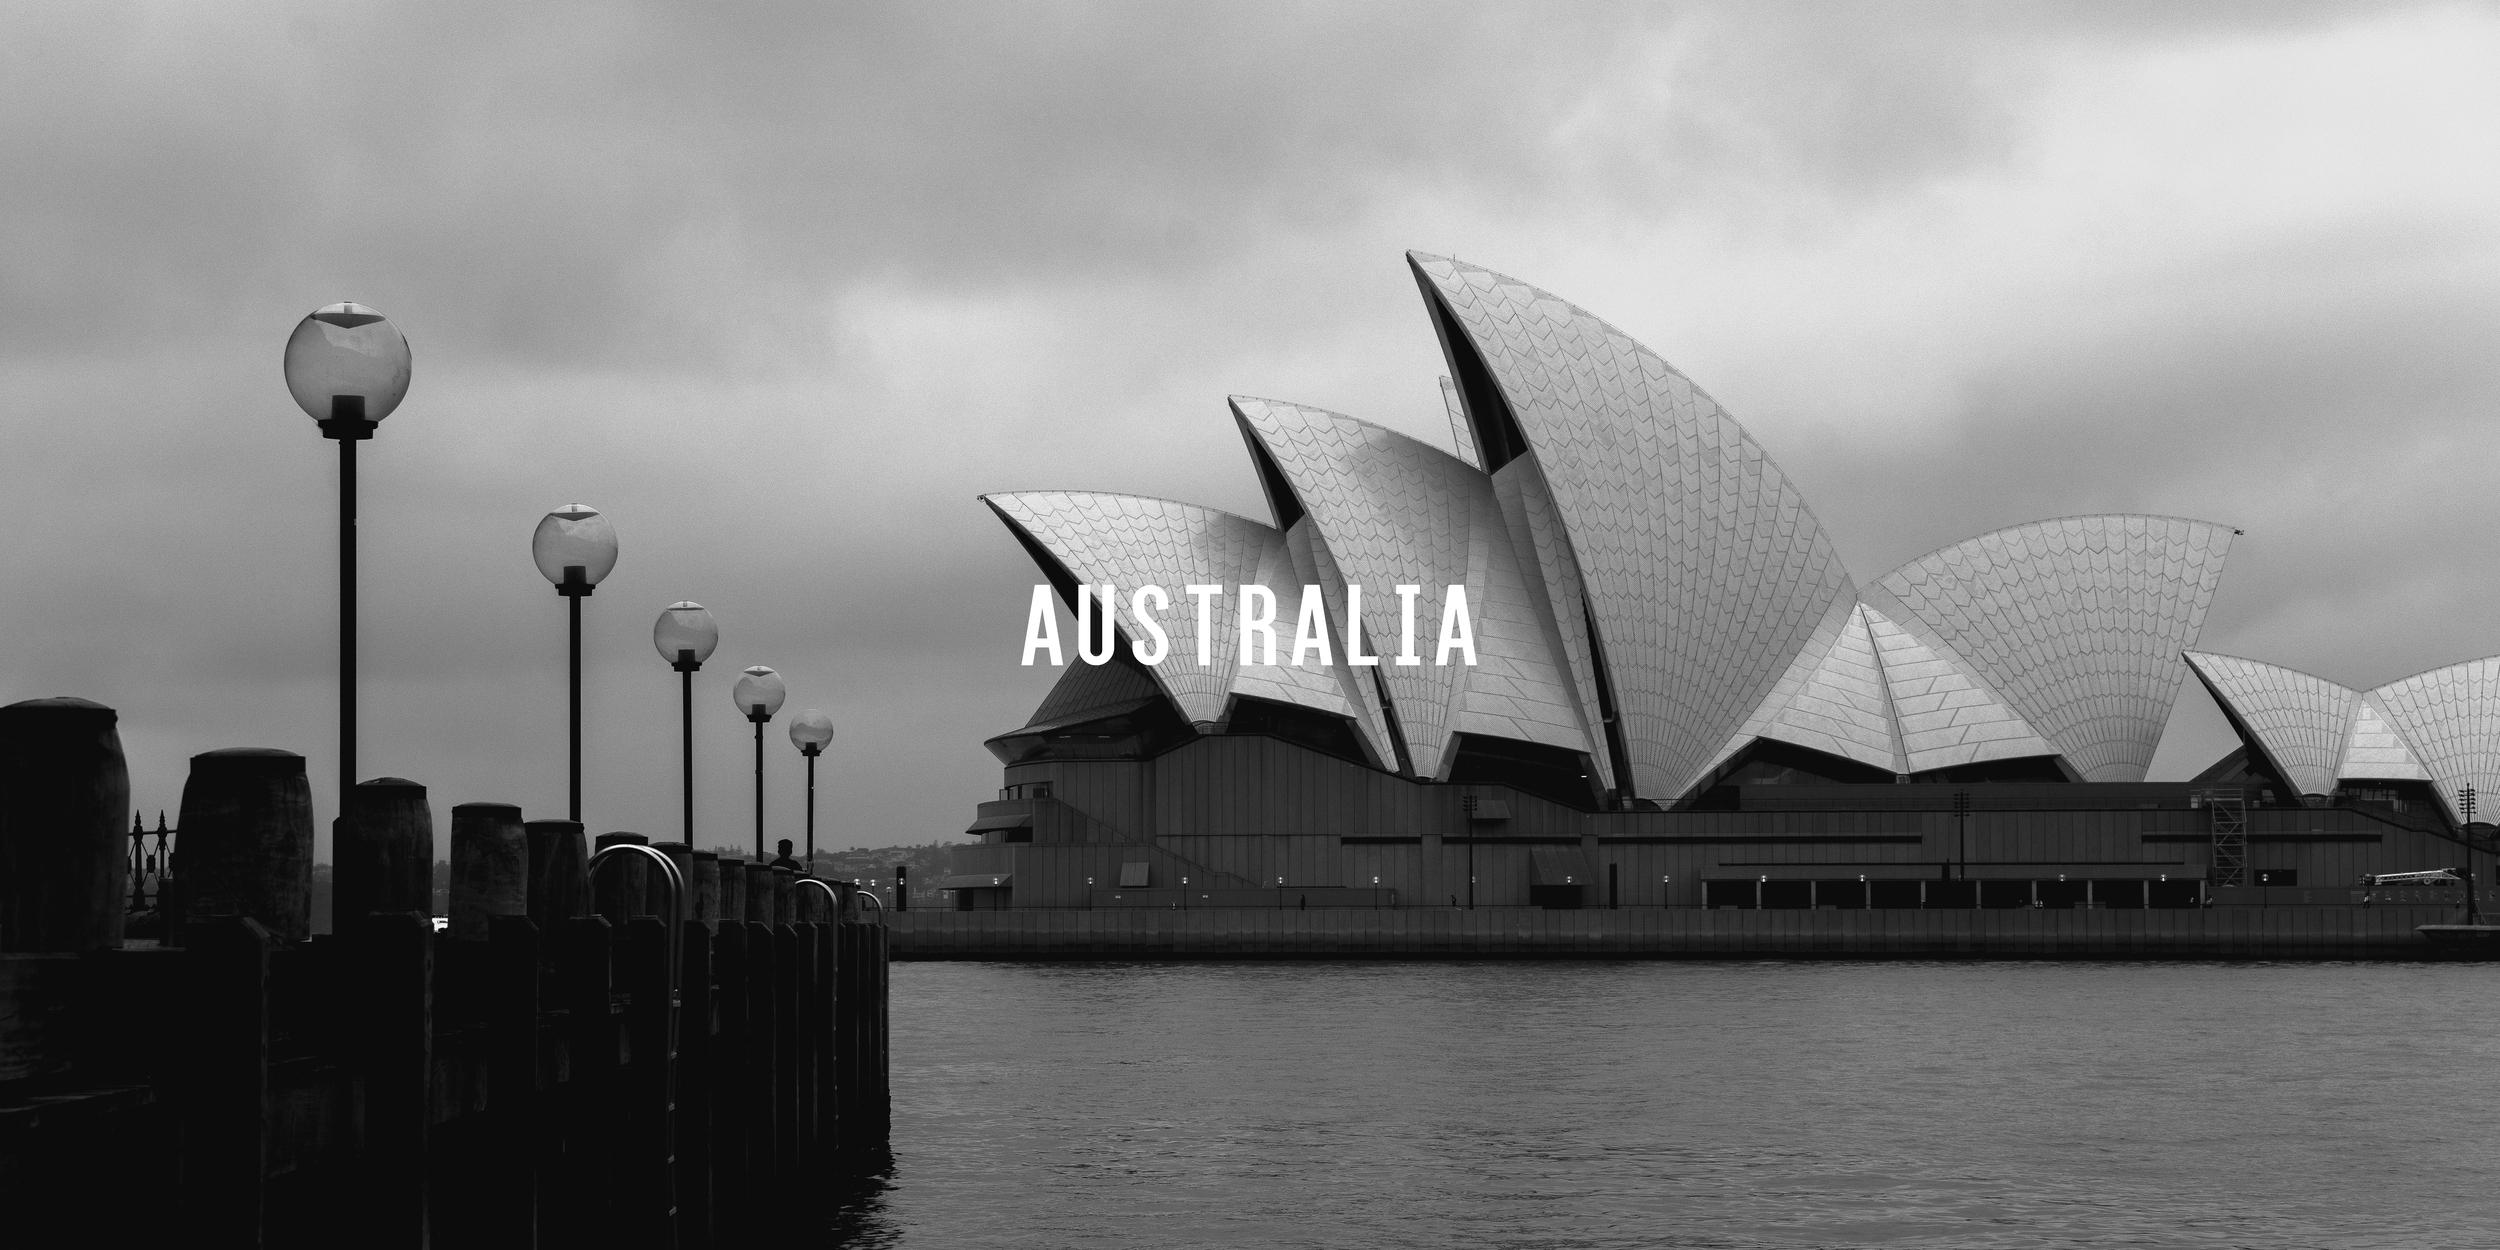 Sending Wec Australia